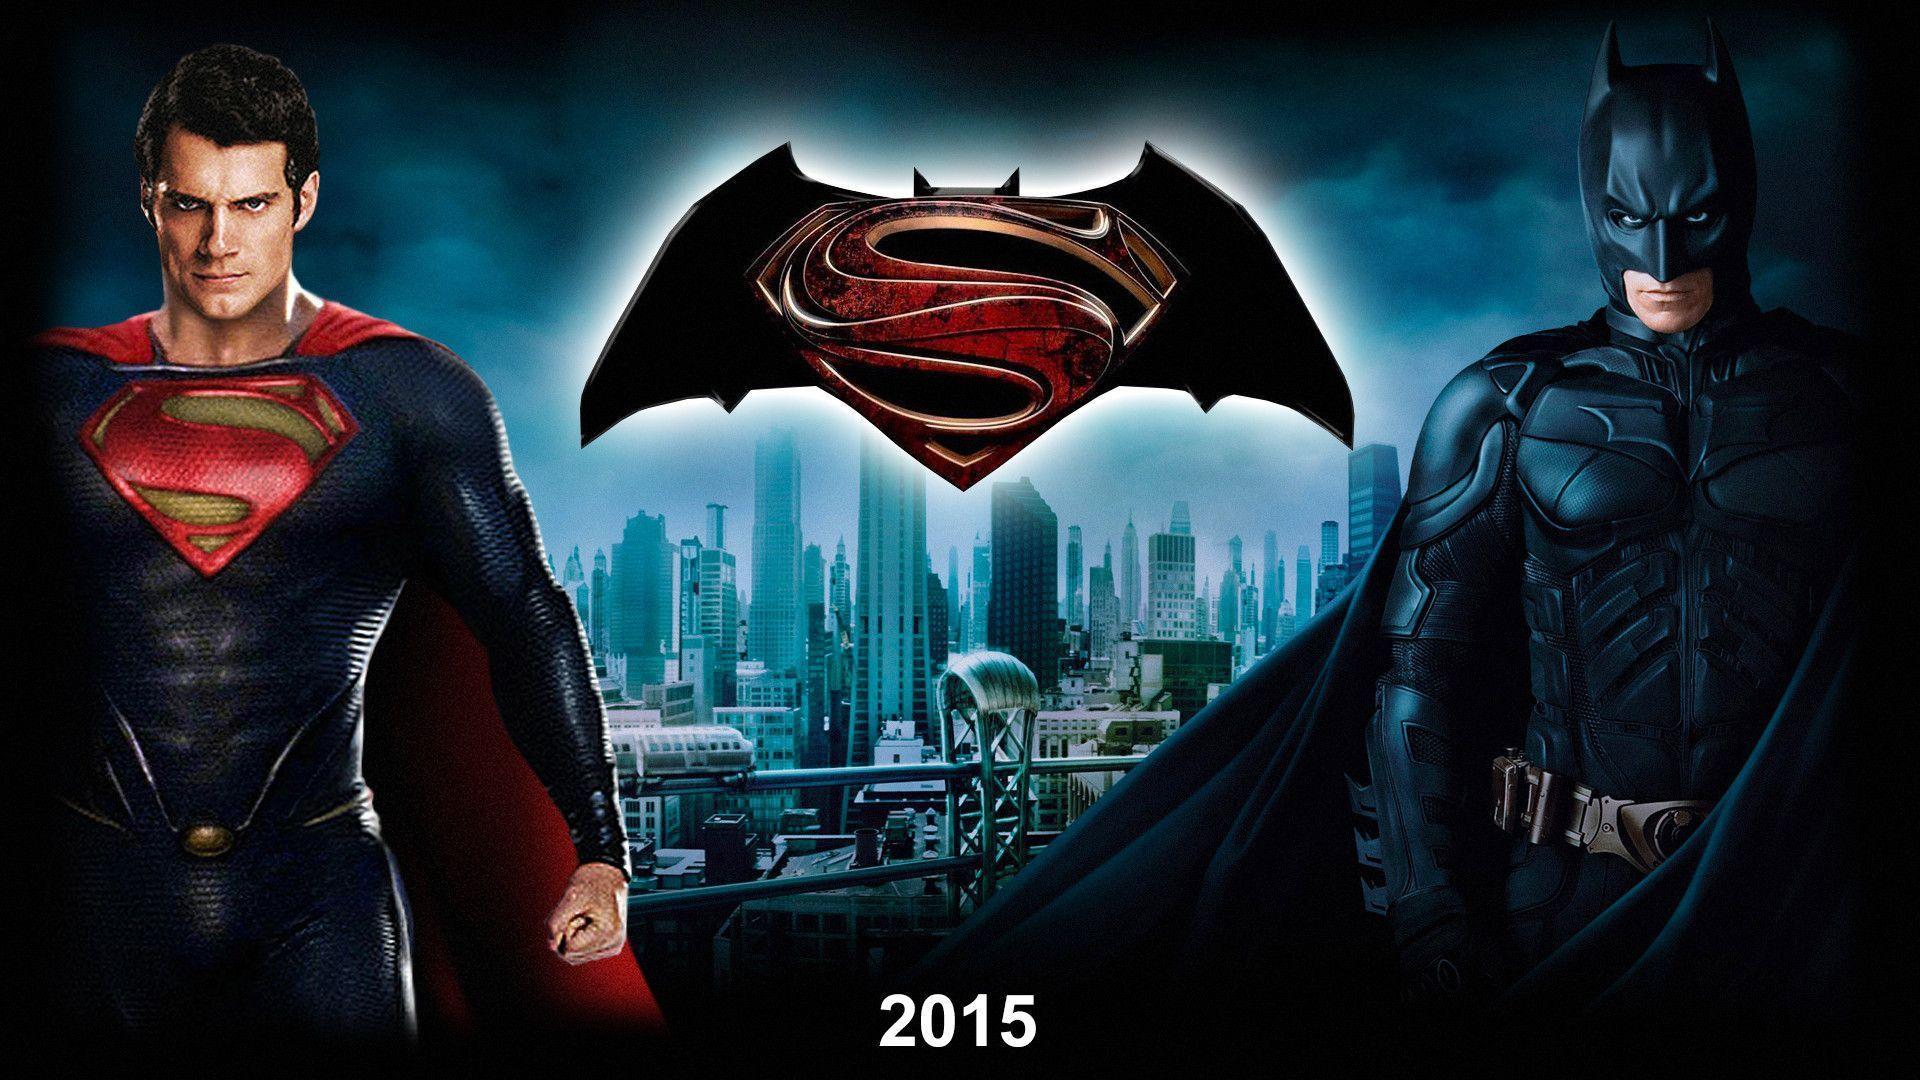 batman and superman cartoon wallpaper - photo #12